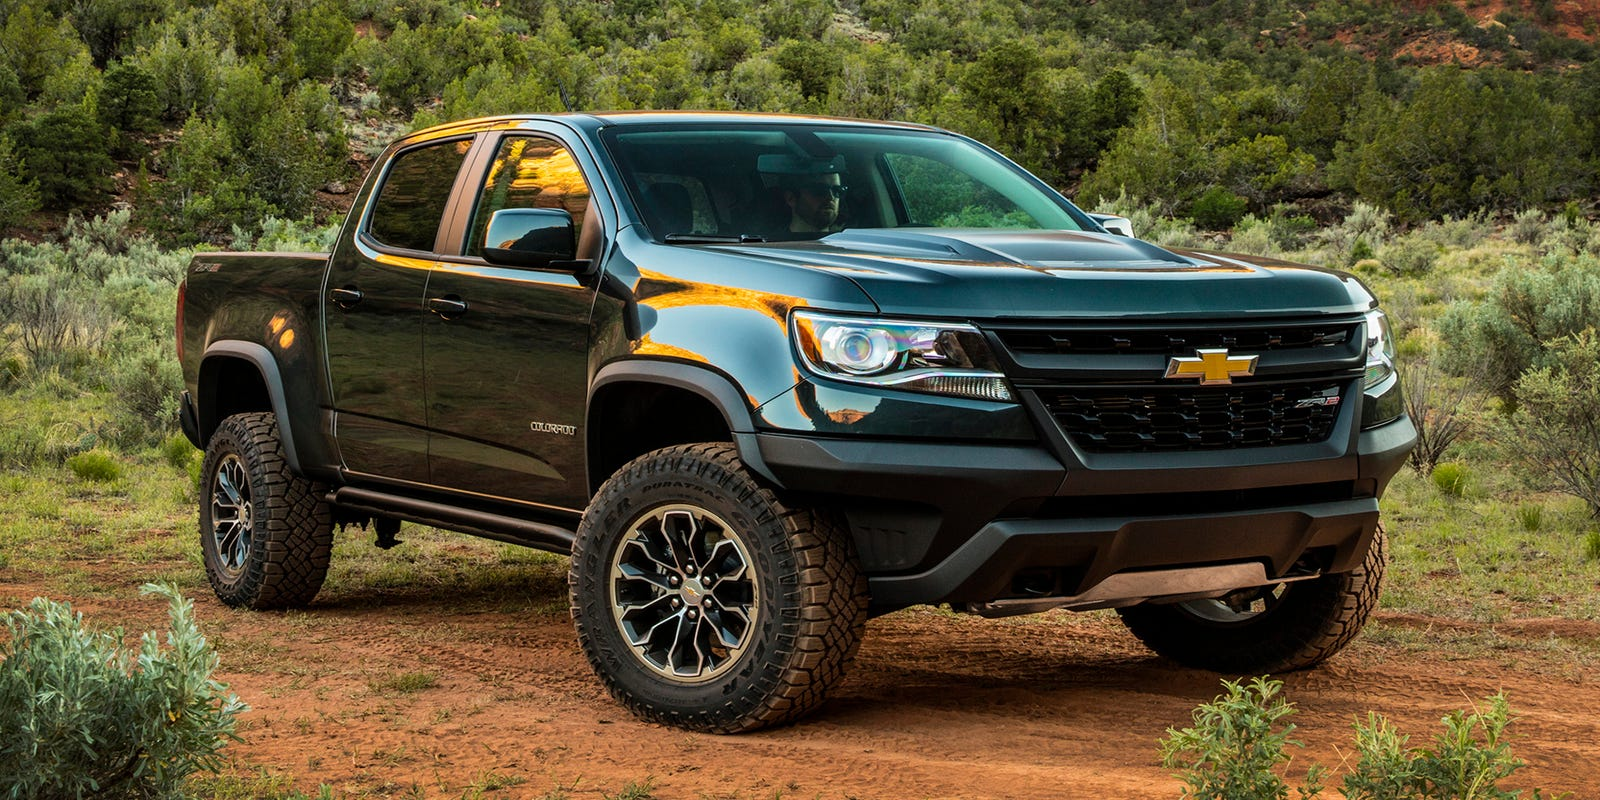 Edmunds Compares 5 Midsize Pickup Trucks